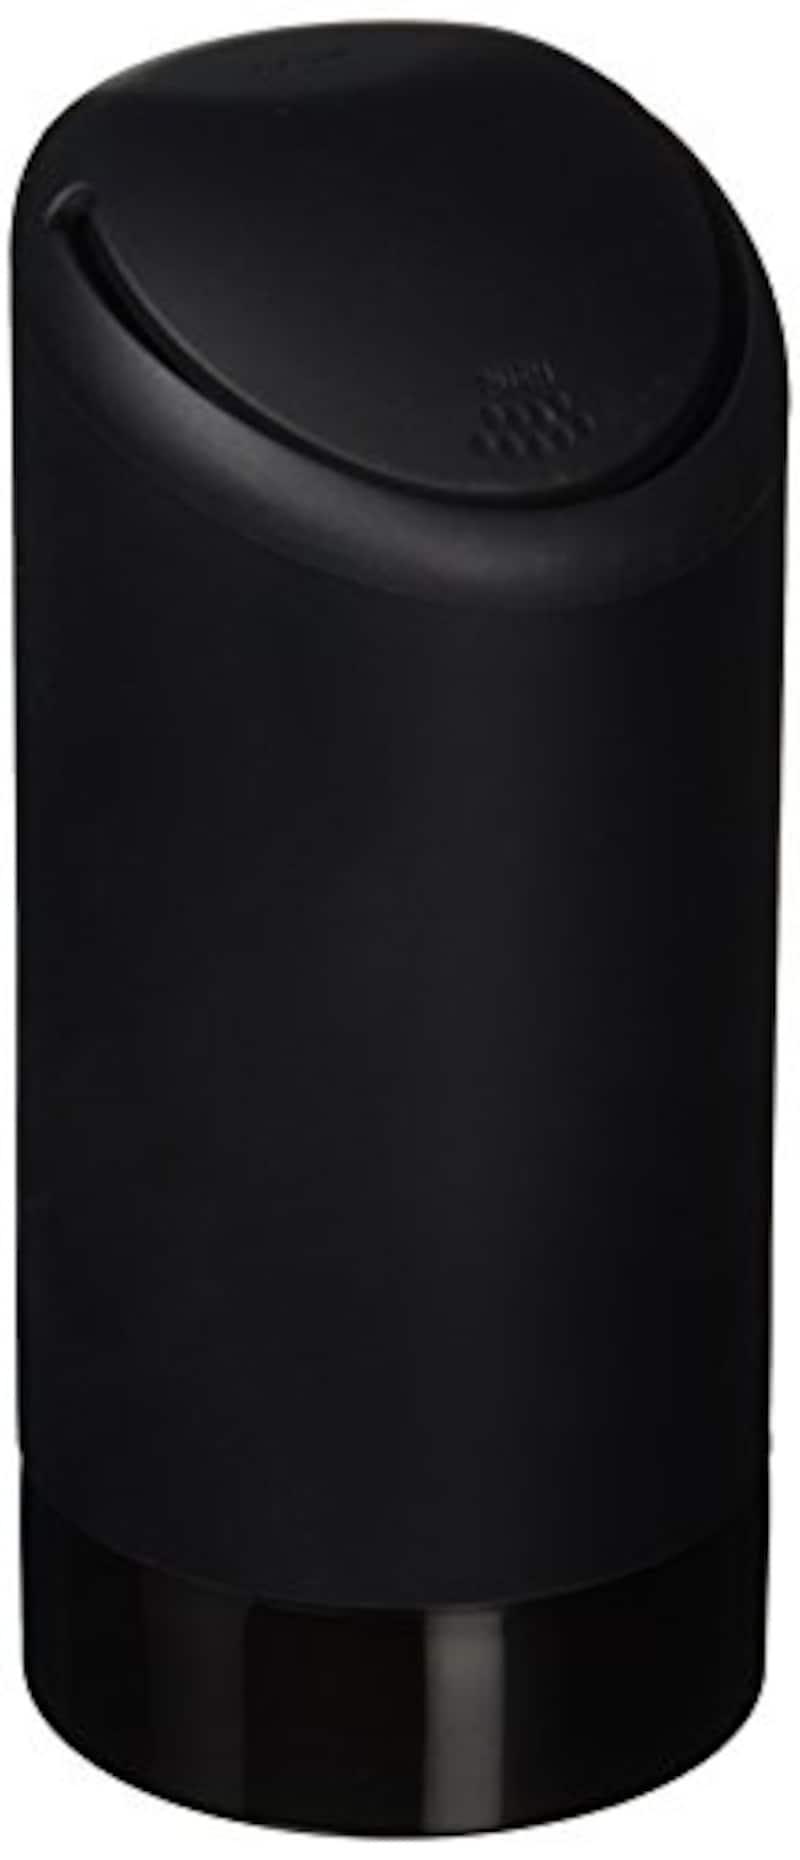 CARMATE(カーメイト),車用 ゴミ箱 スマートボトル,DZ379